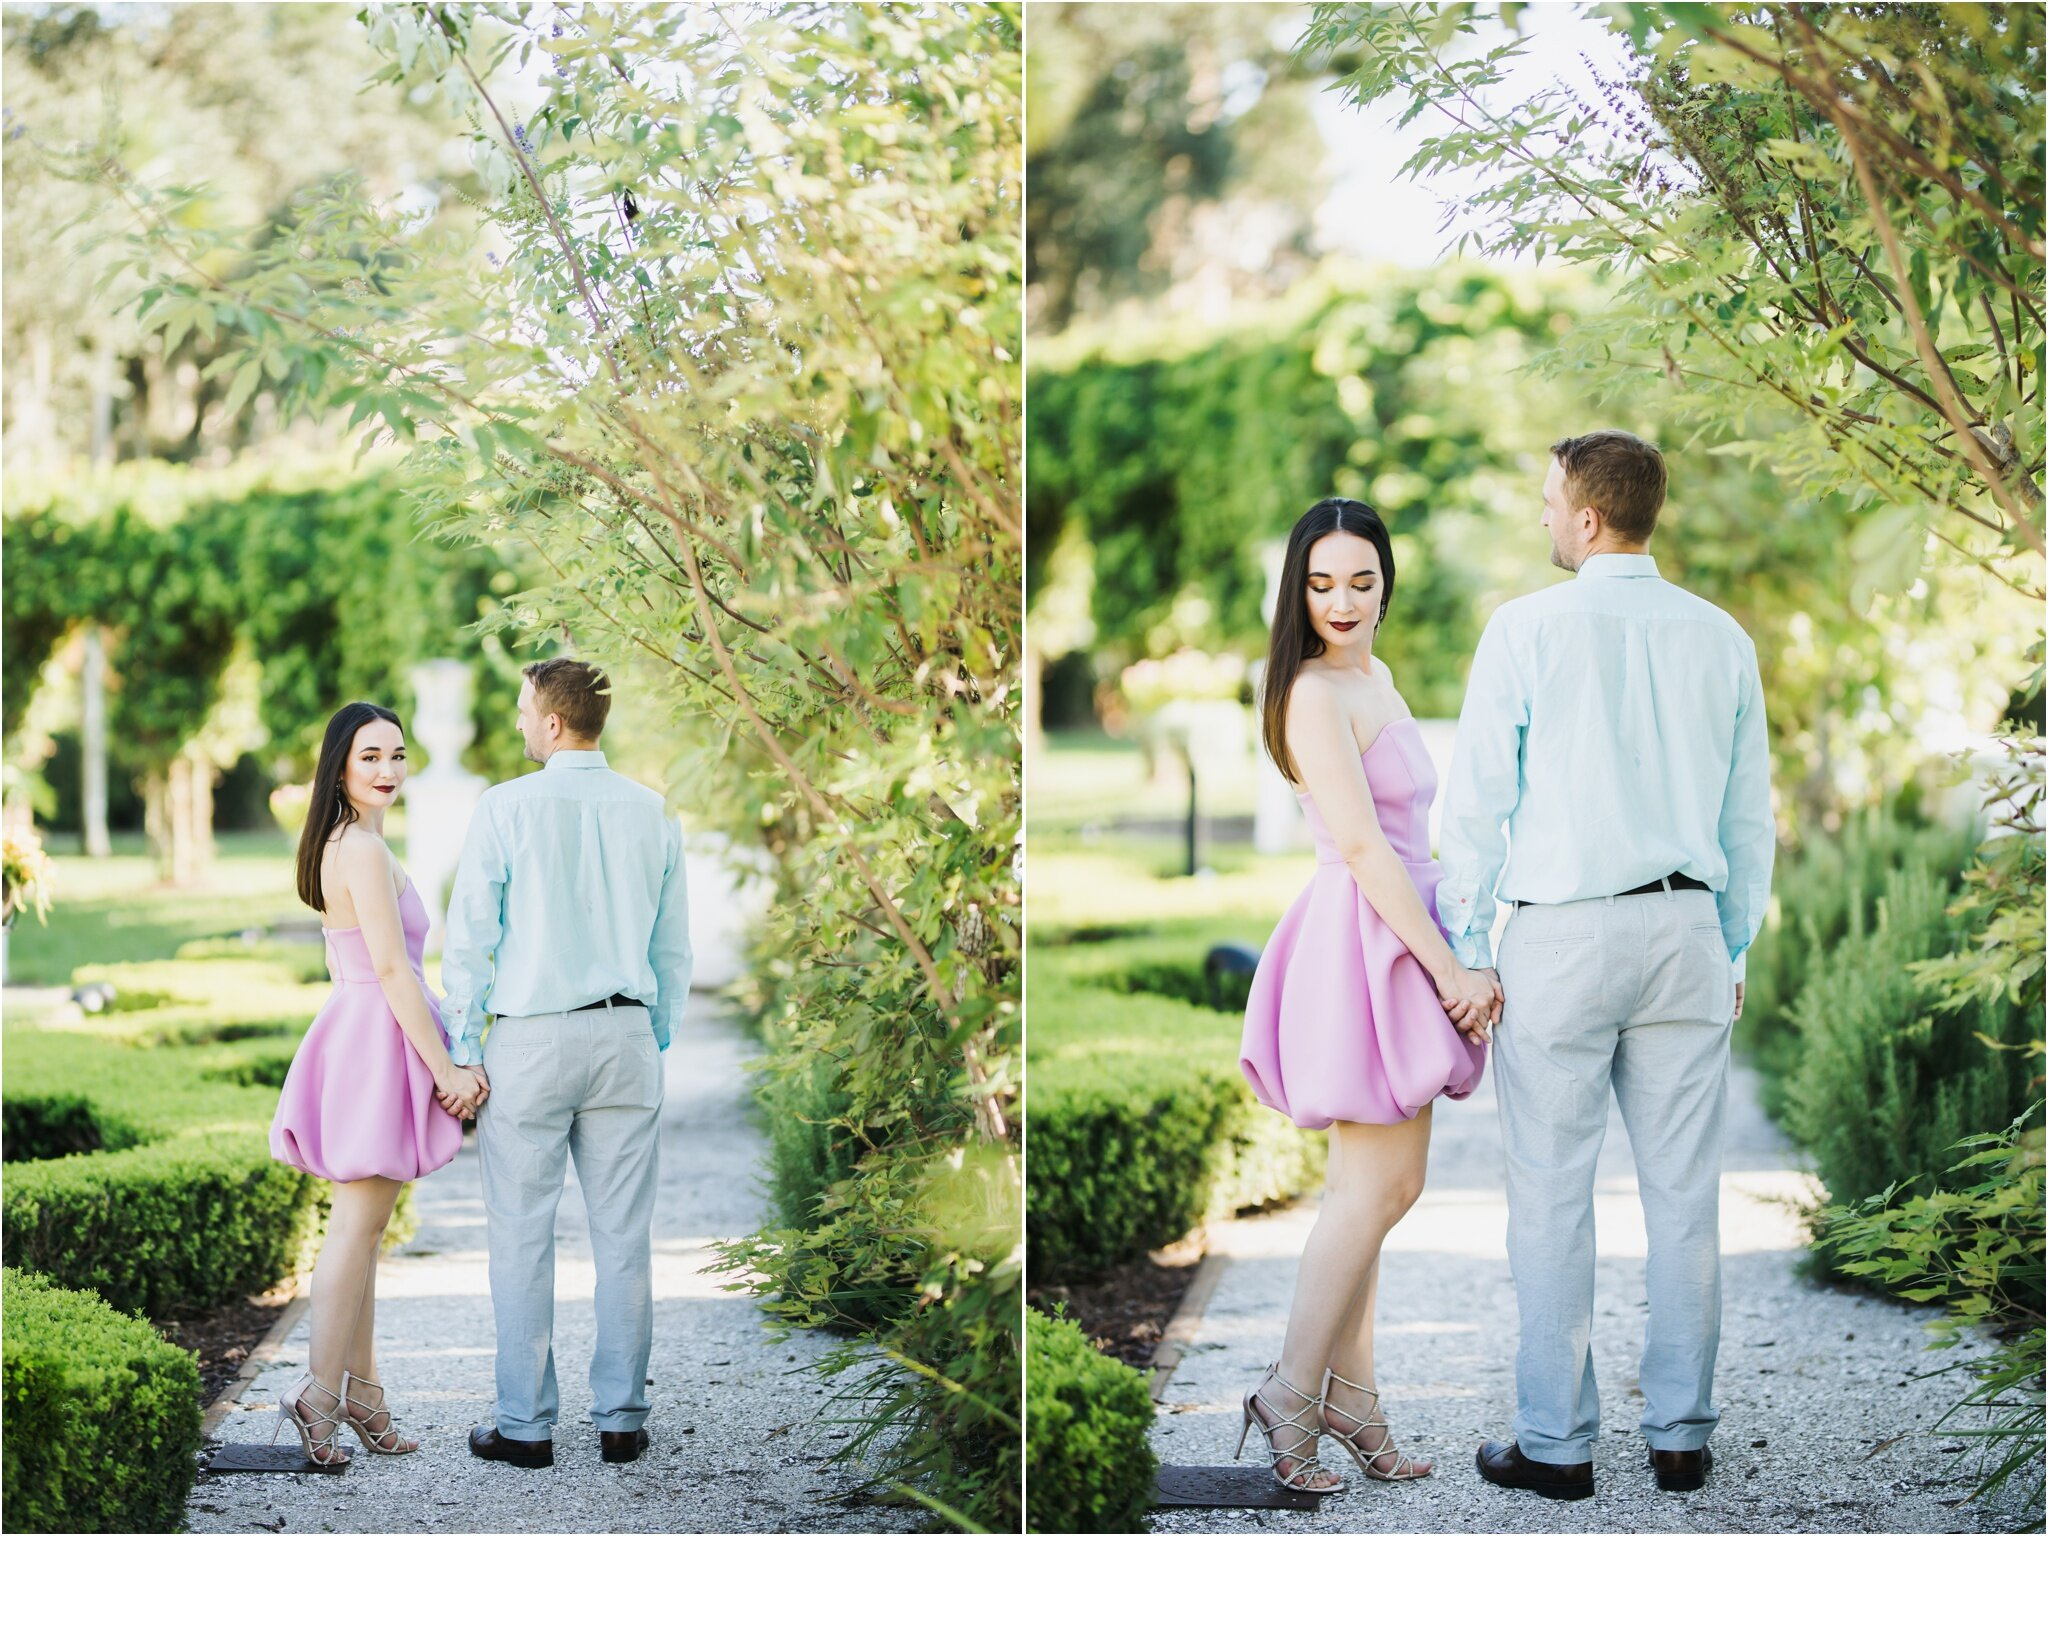 Rainey_Gregg_Photography_St._Simons_Island_Georgia_California_Wedding_Portrait_Photography_1820.jpg